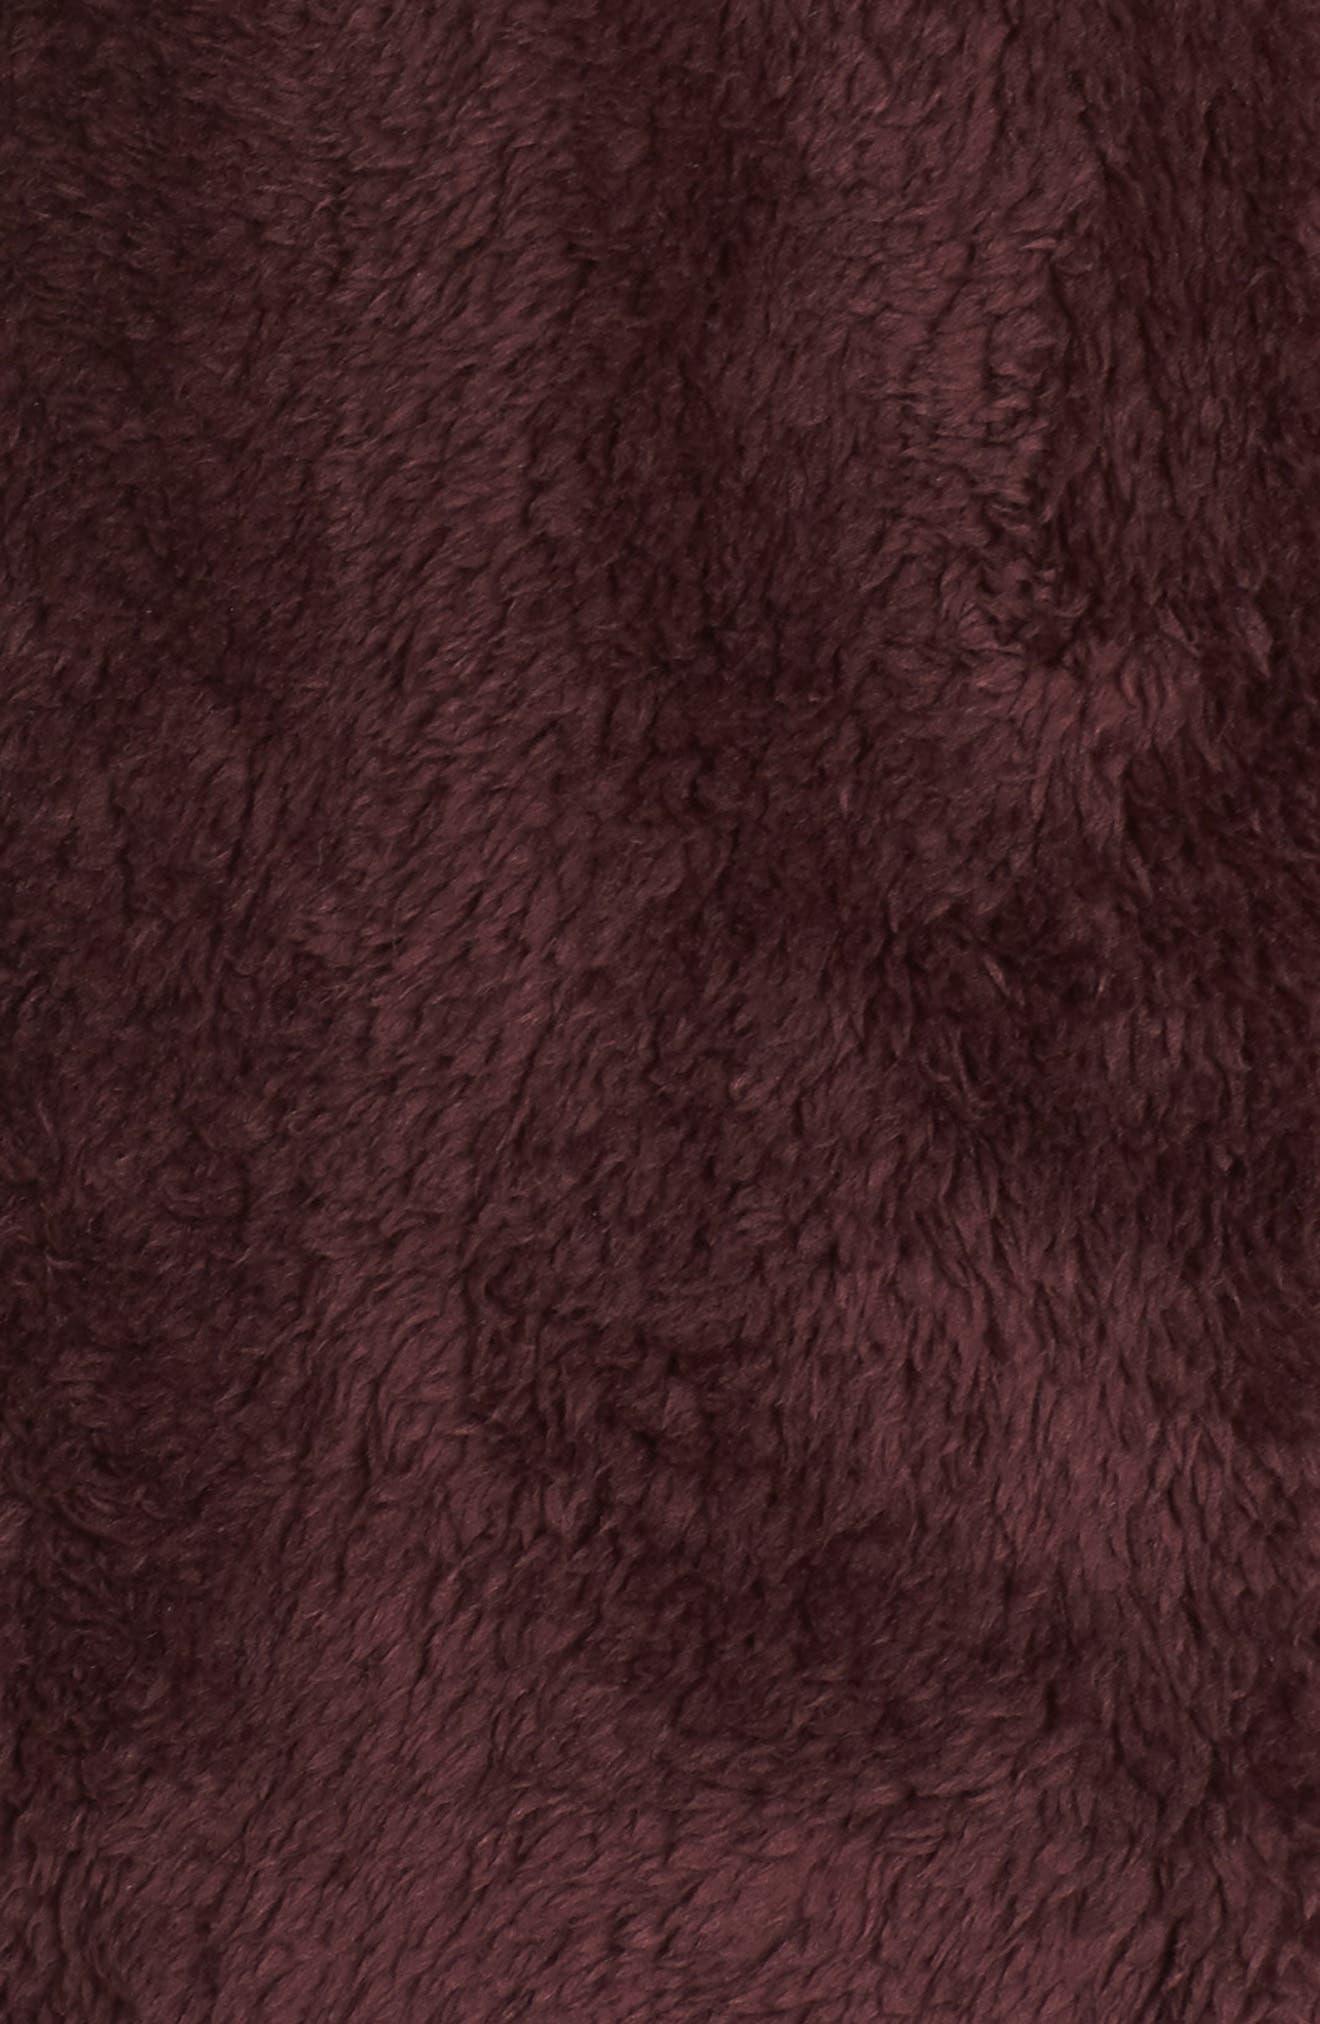 NSW Fleece Bomber Jacket,                             Alternate thumbnail 6, color,                             930